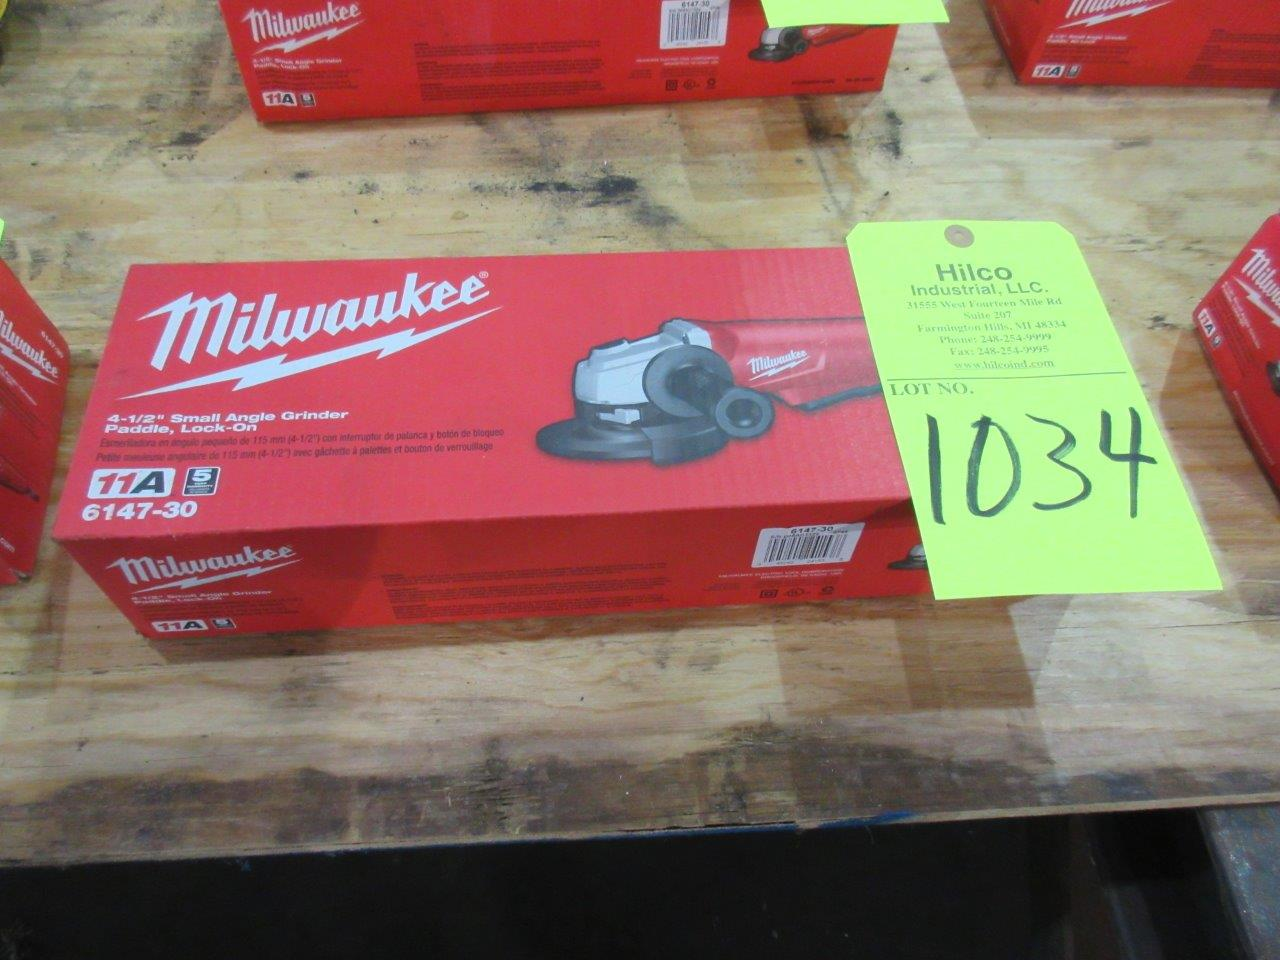 "Milwaukee Cat # 6147-30 New 4 1/2"" Angle Grinder"